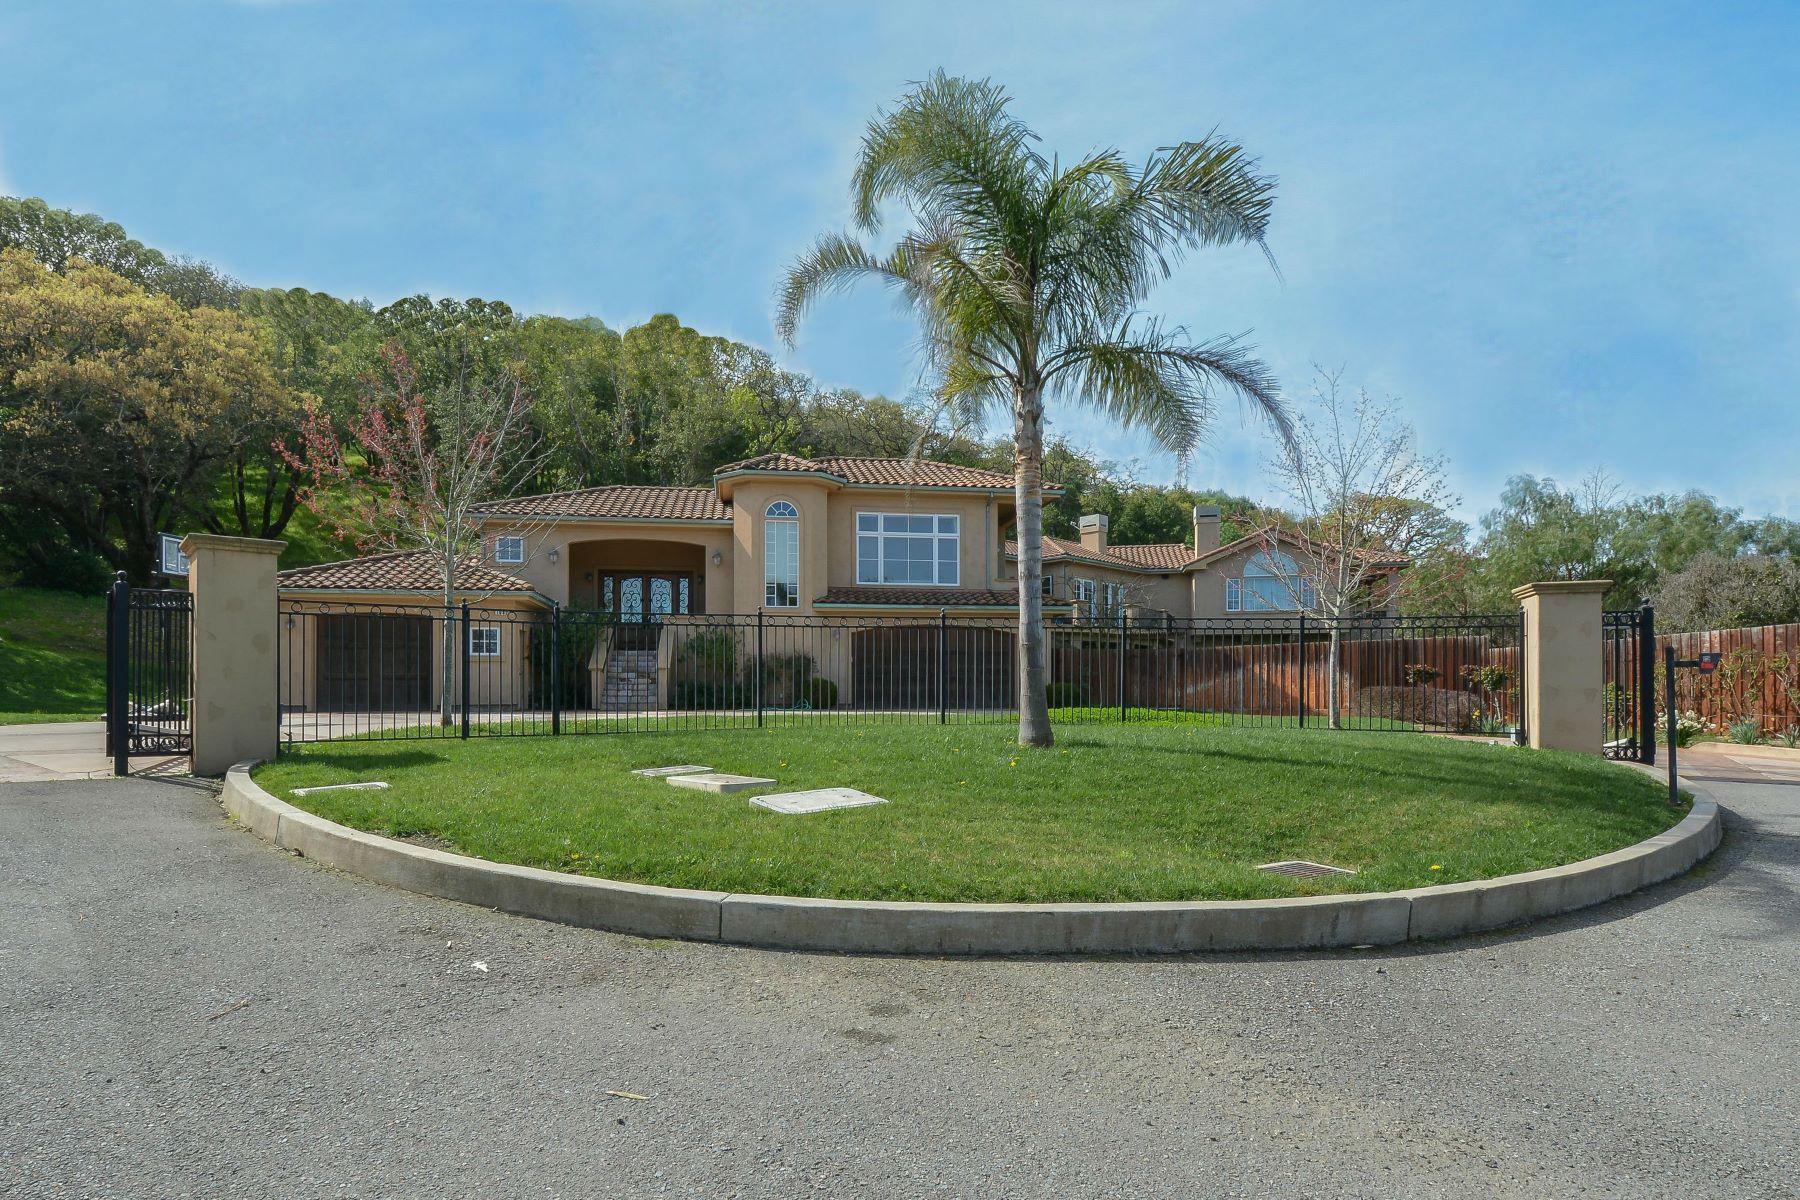 Single Family Home for Sale at Private Gated Mediterranean Novato Estate 106 Kristin Marie Court Novato, California 94945 United States